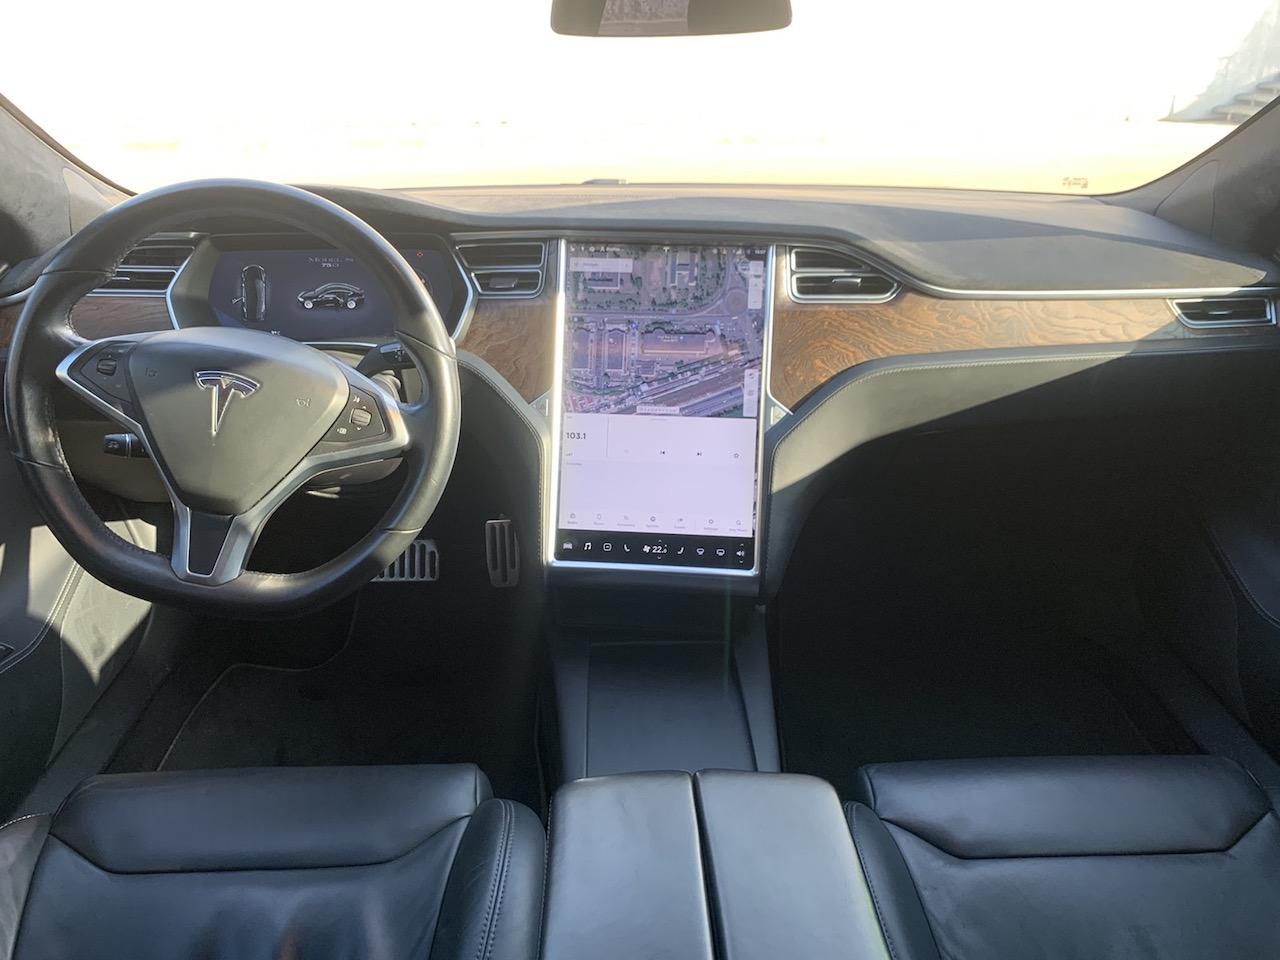 Аренда Tesla Model S в Киеве - Rent convertible in Kiev, rent sports (1)